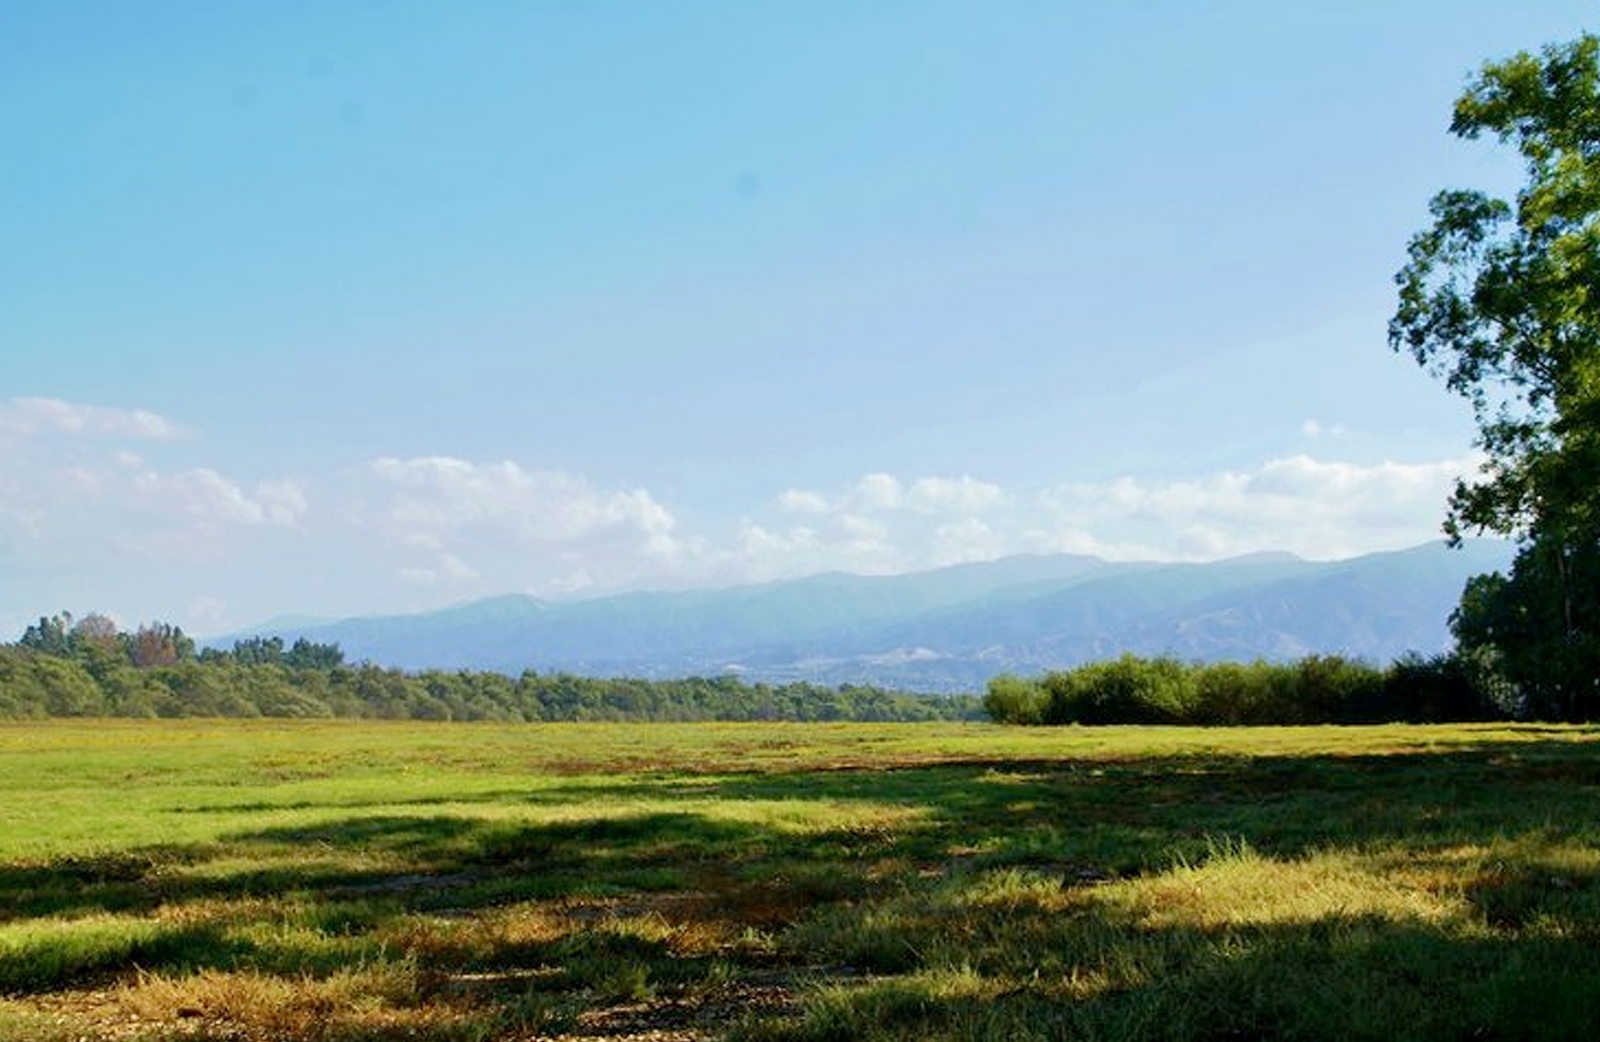 The Prado dog park field with grass and trees.